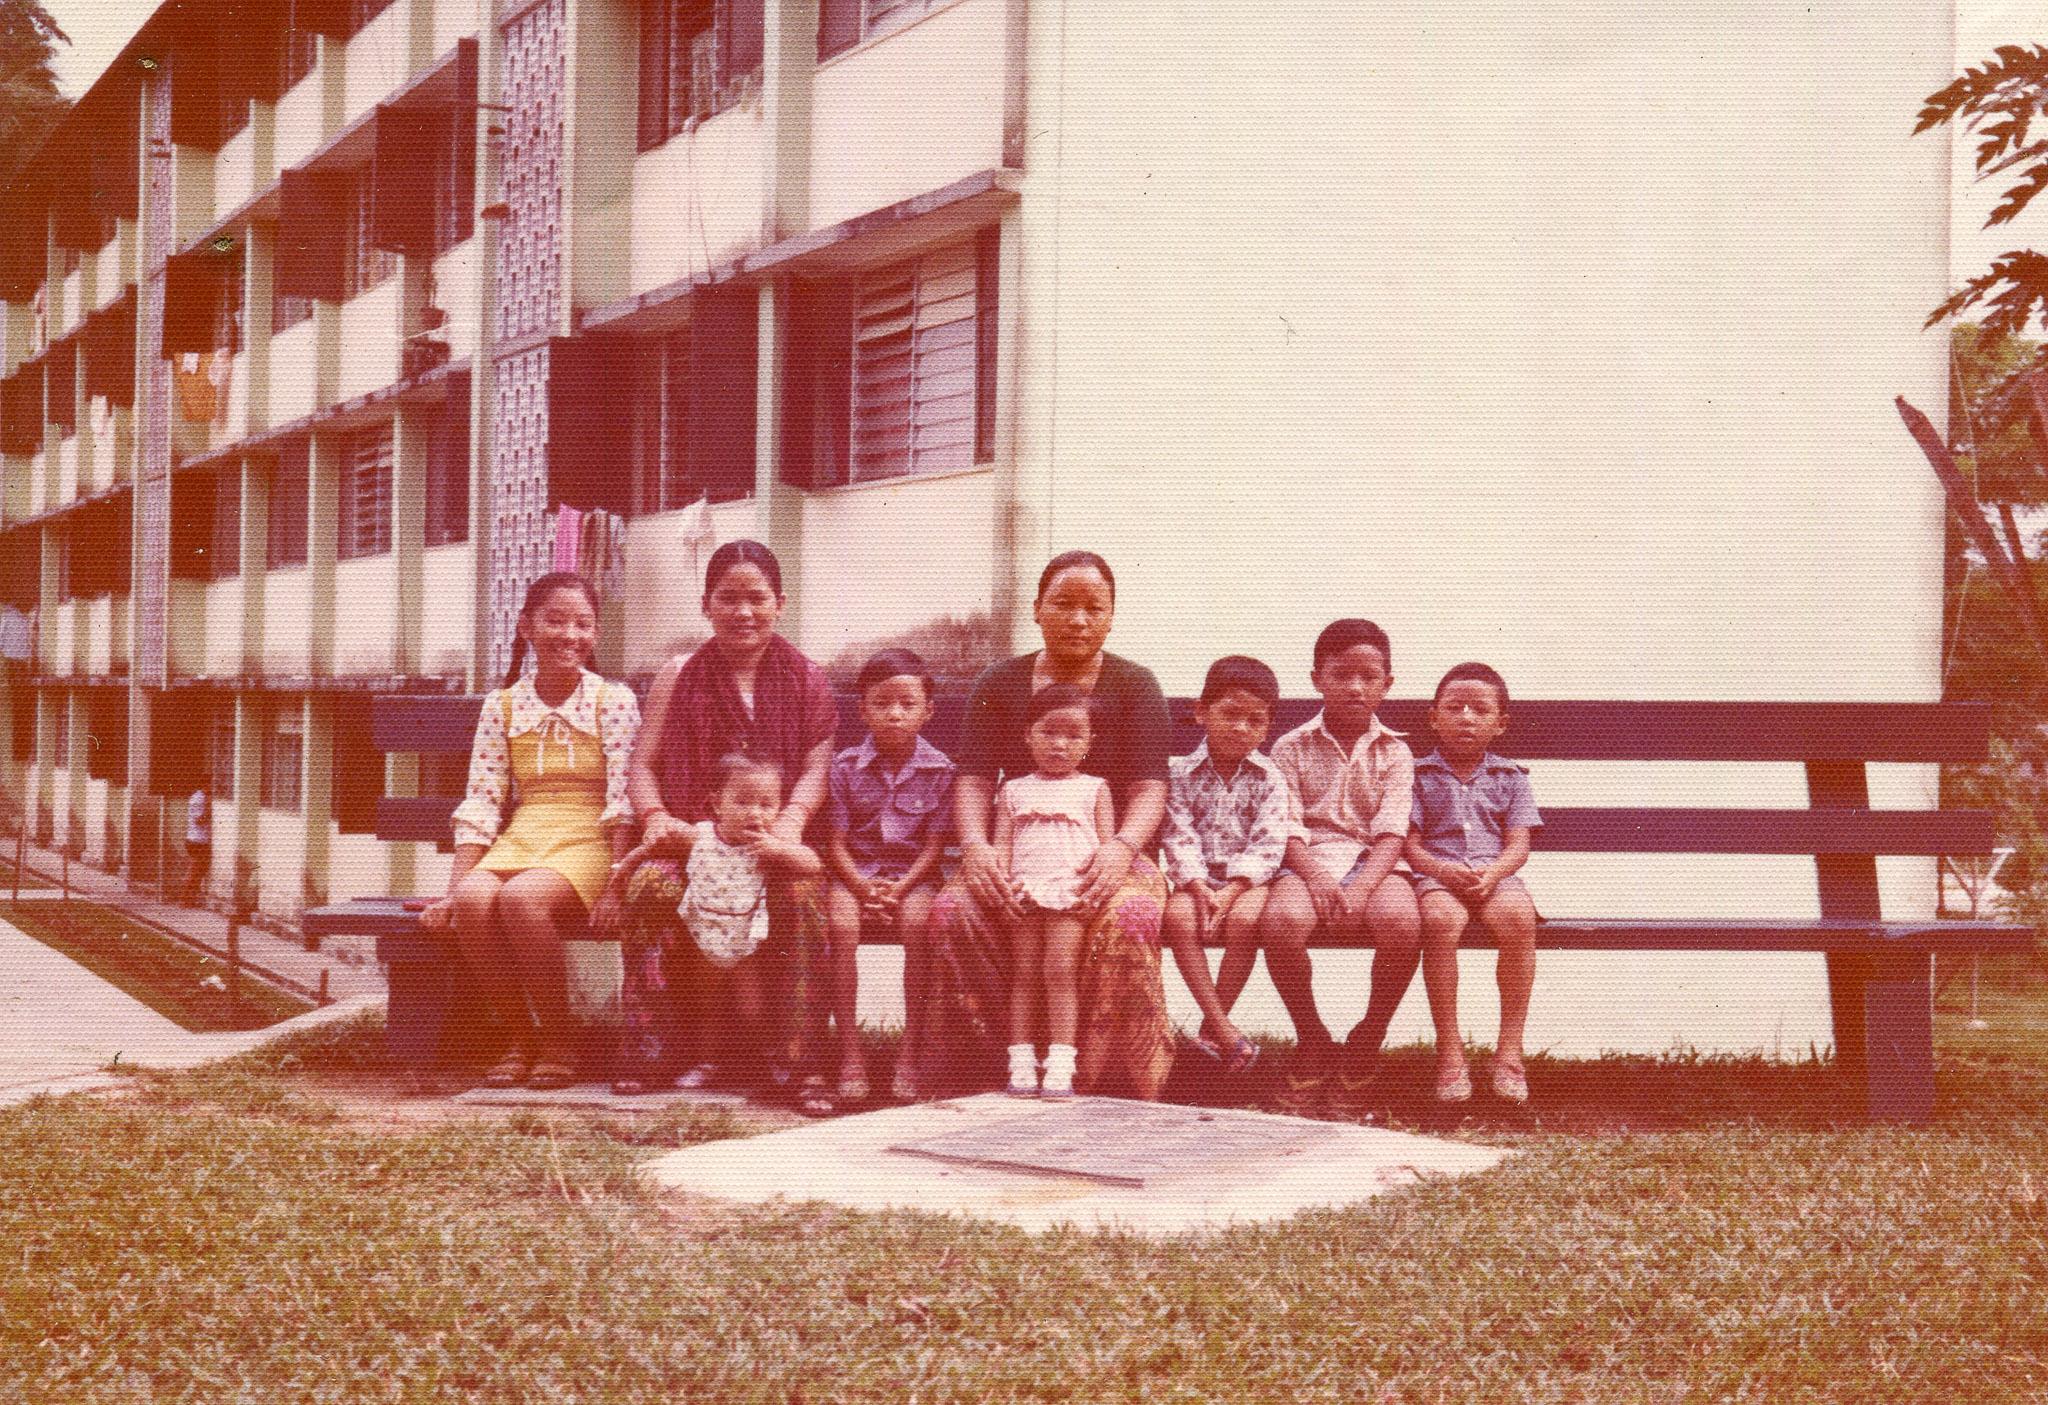 singapore-gurkhas-archive-photo-museum-zakaria-zainal-49.jpg